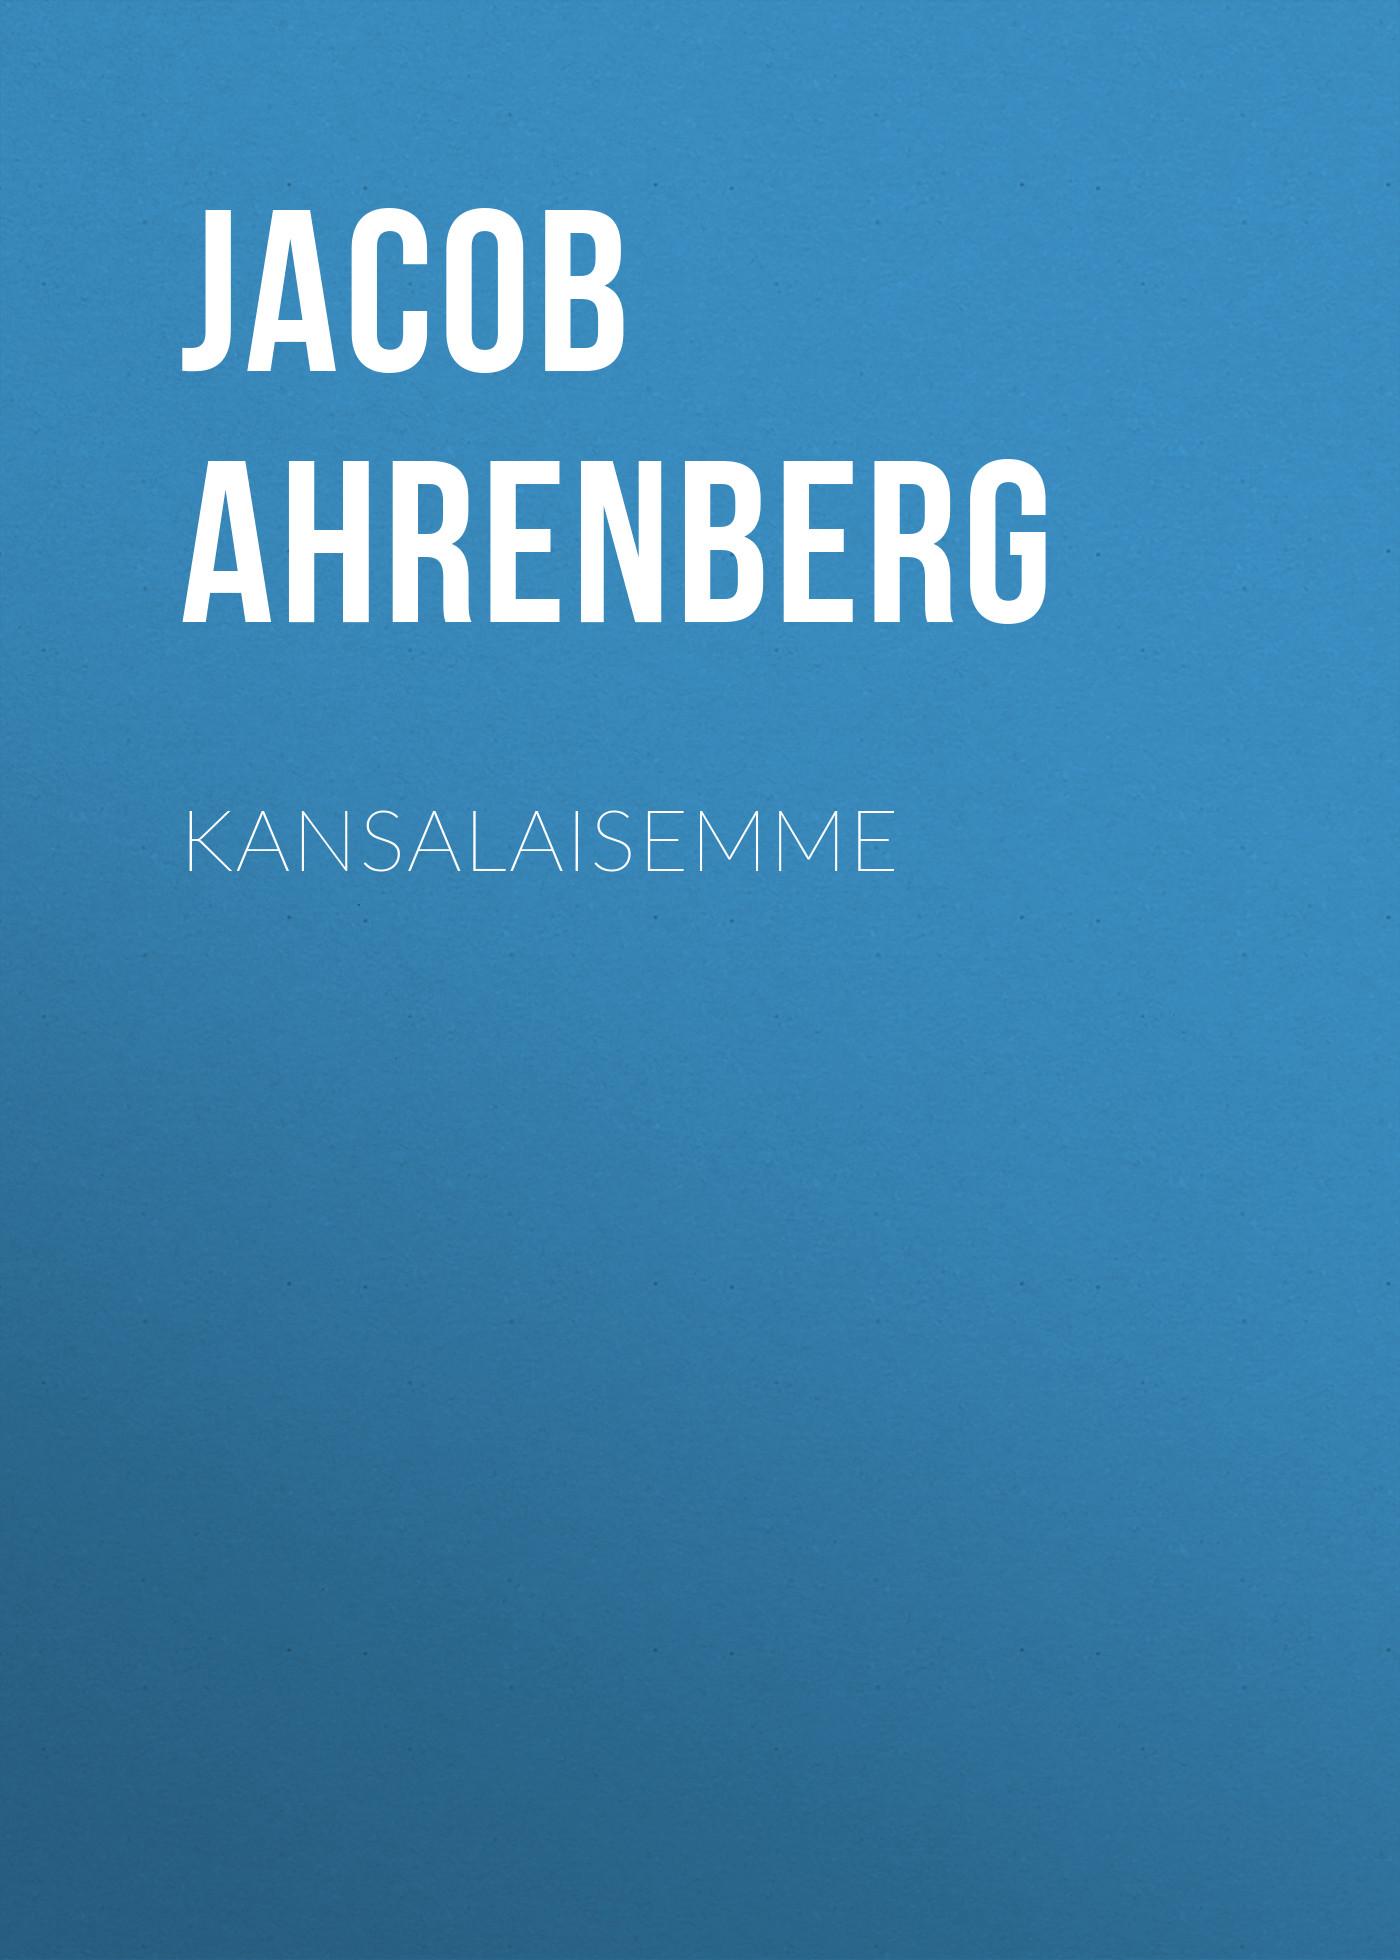 Jacob Ahrenberg Kansalaisemme jacob ahrenberg hihhuleita kuvauksia ita suomesta finnish edition